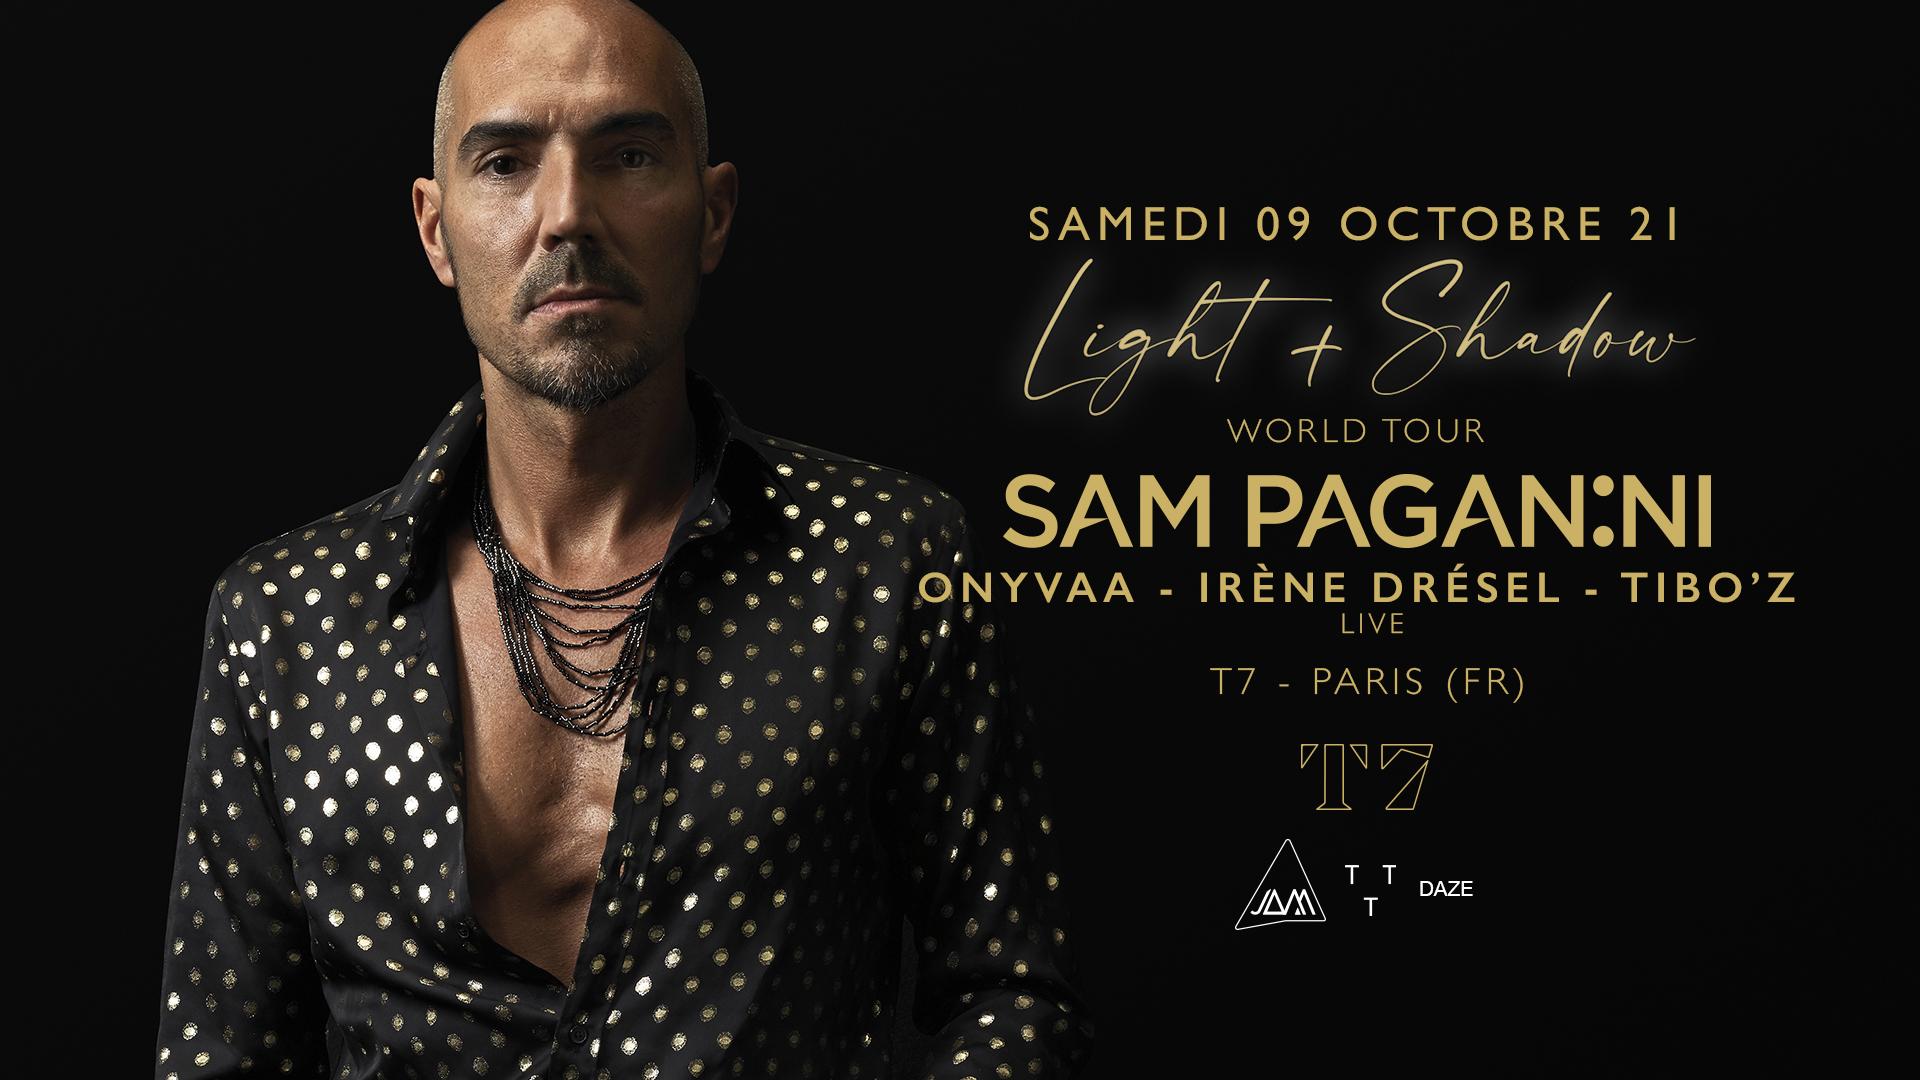 T7 : SAM PAGANINI (Light + Shadow World Tour)